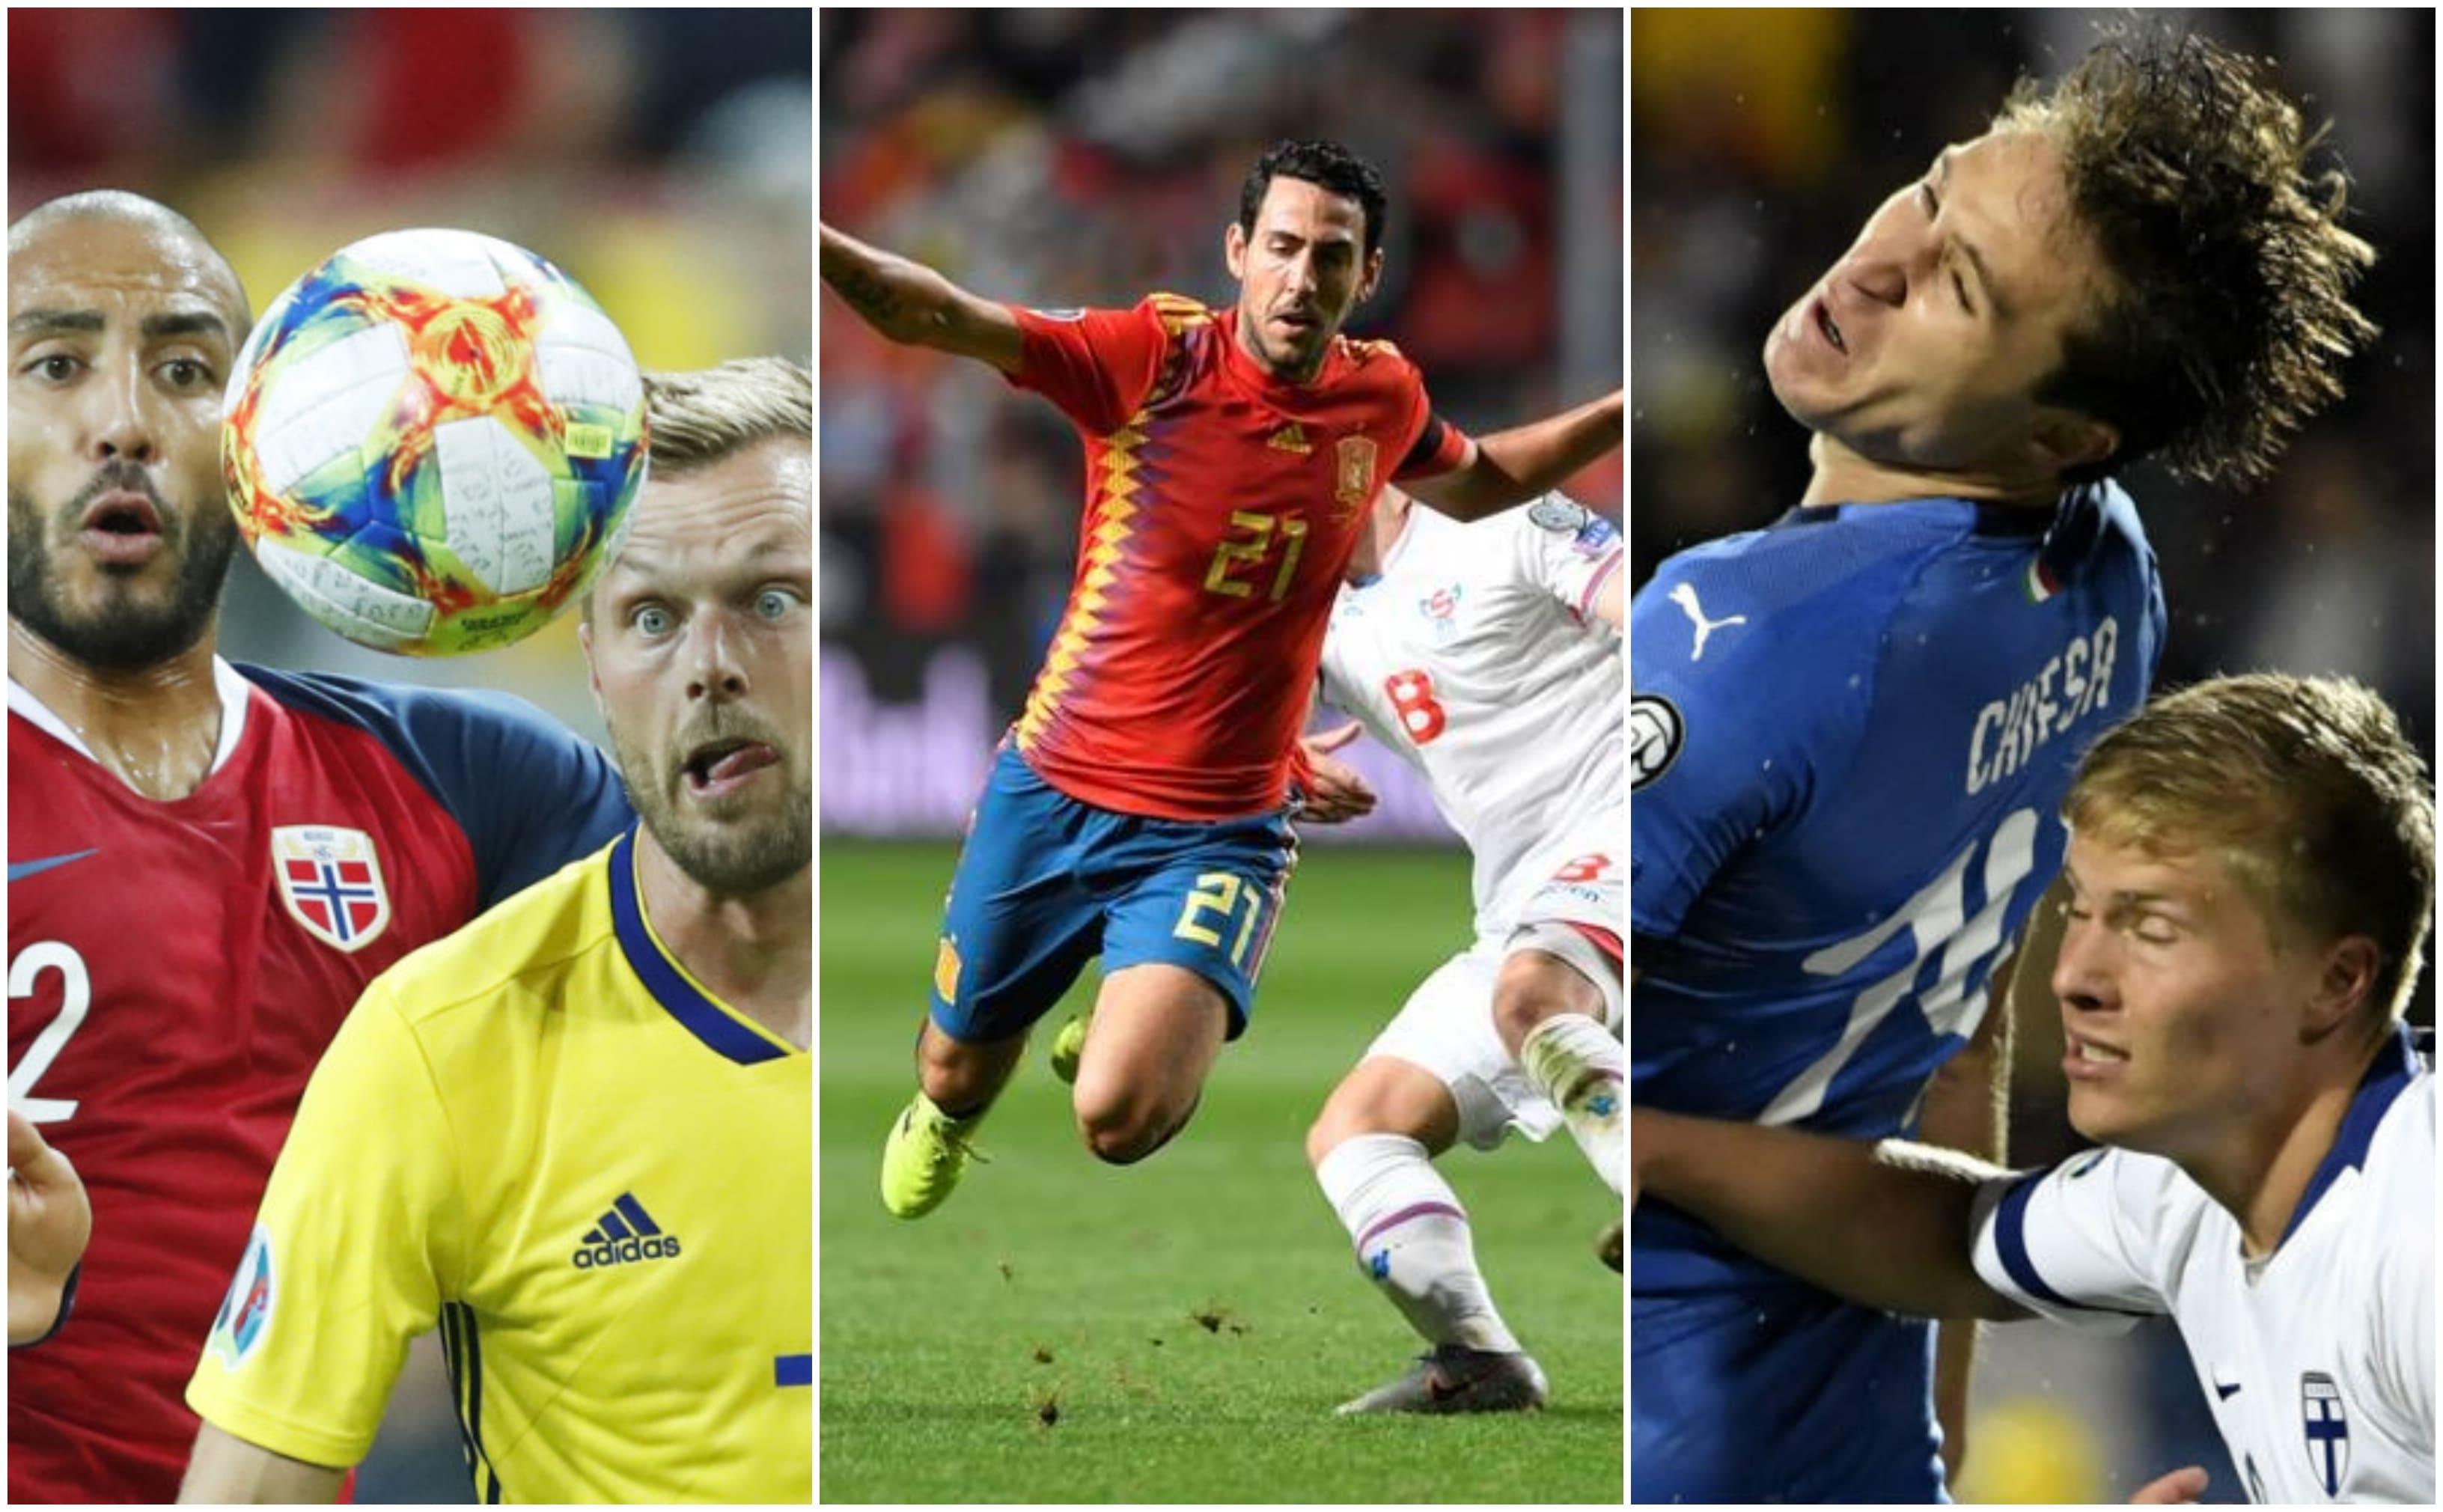 Euro 2020 Qualifyers Match Day 08.09.2019 Round Up